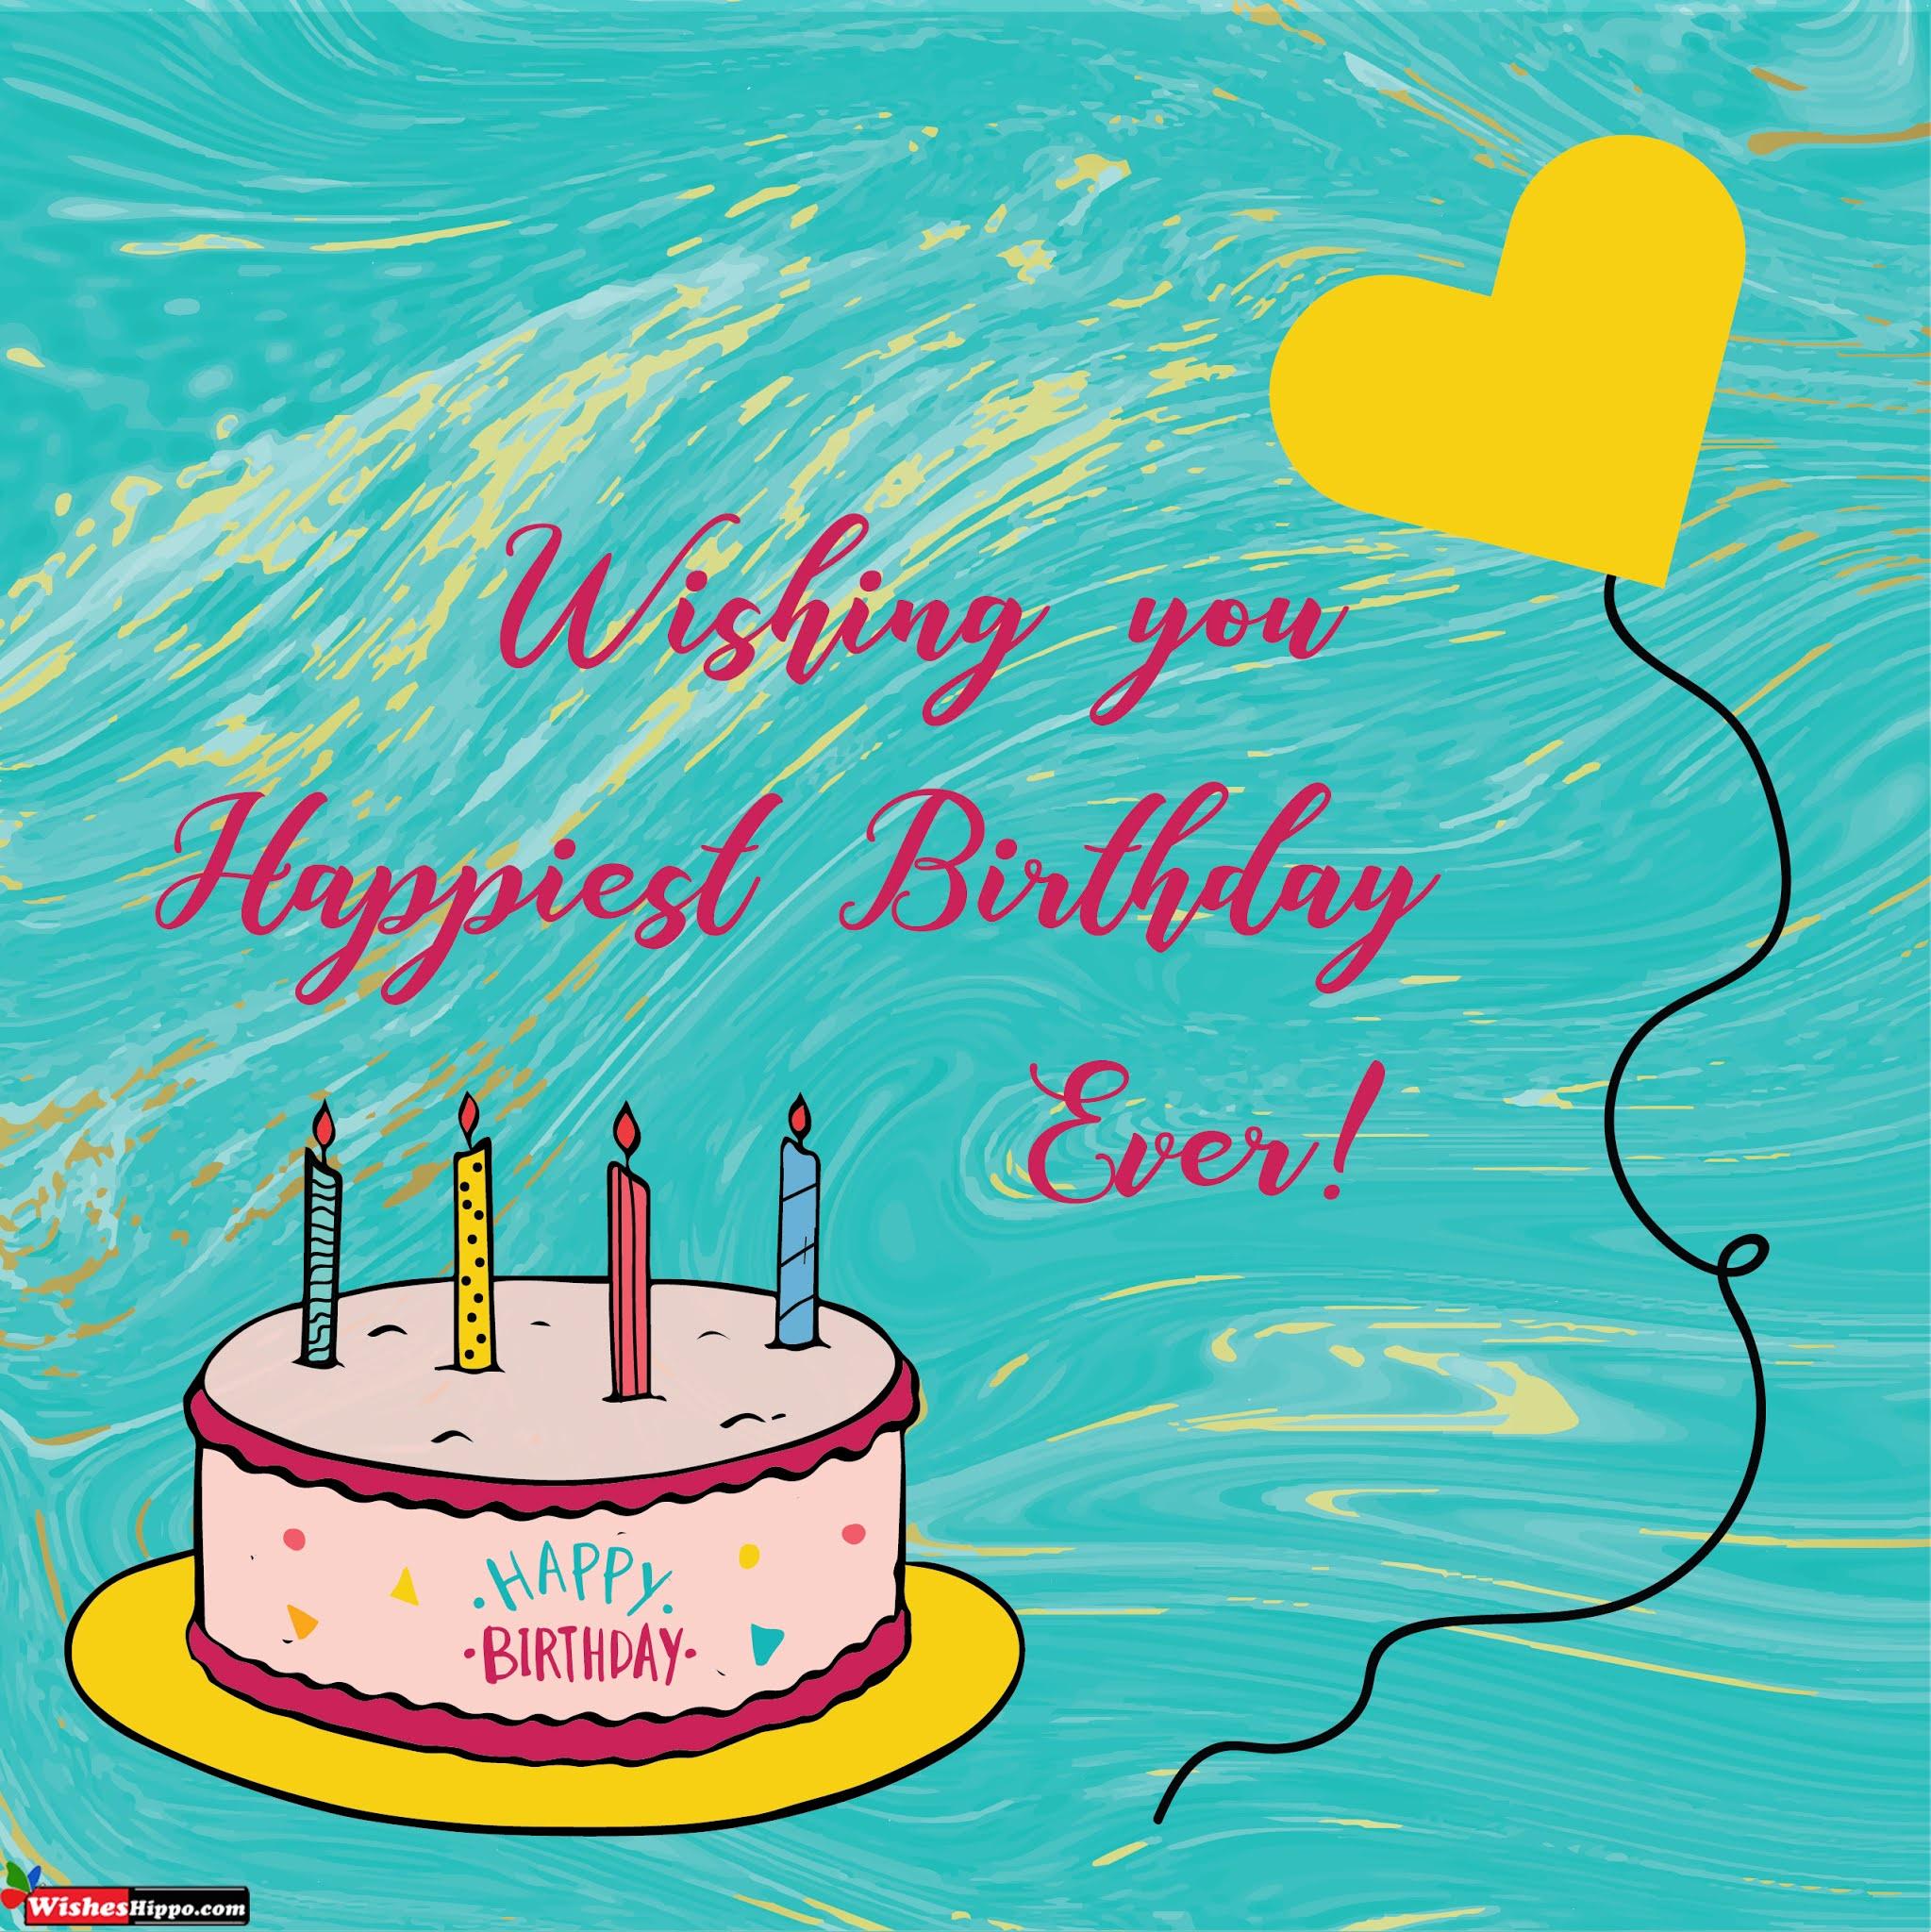 100 Best Happy Birthday Wishes For Male Friend Wisheshippo